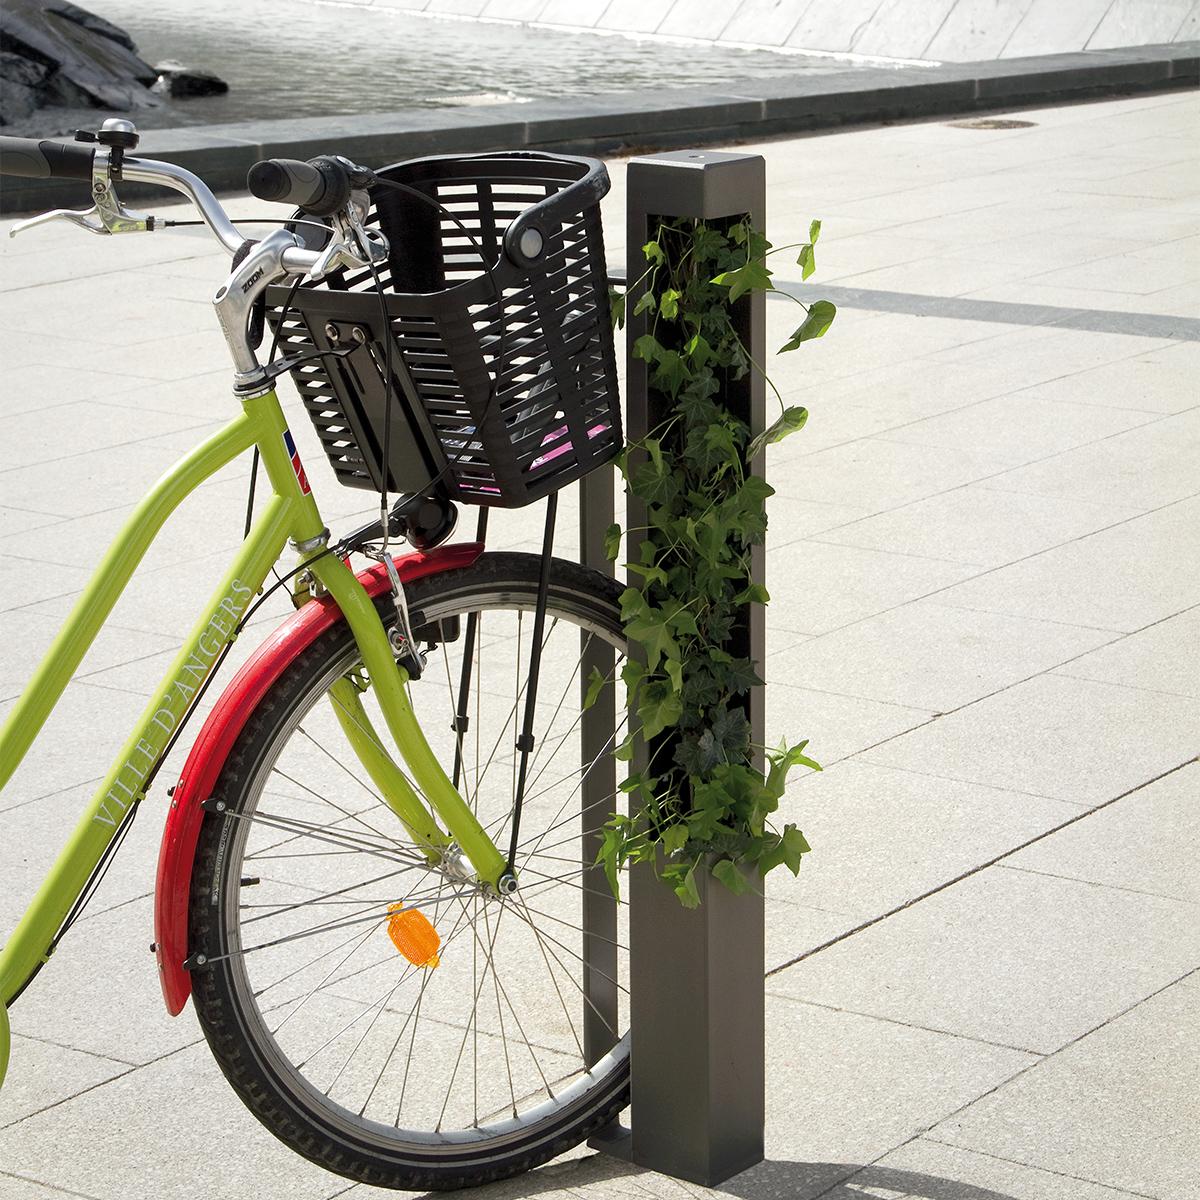 ATECH-eco-district-design-bike-hedera-range